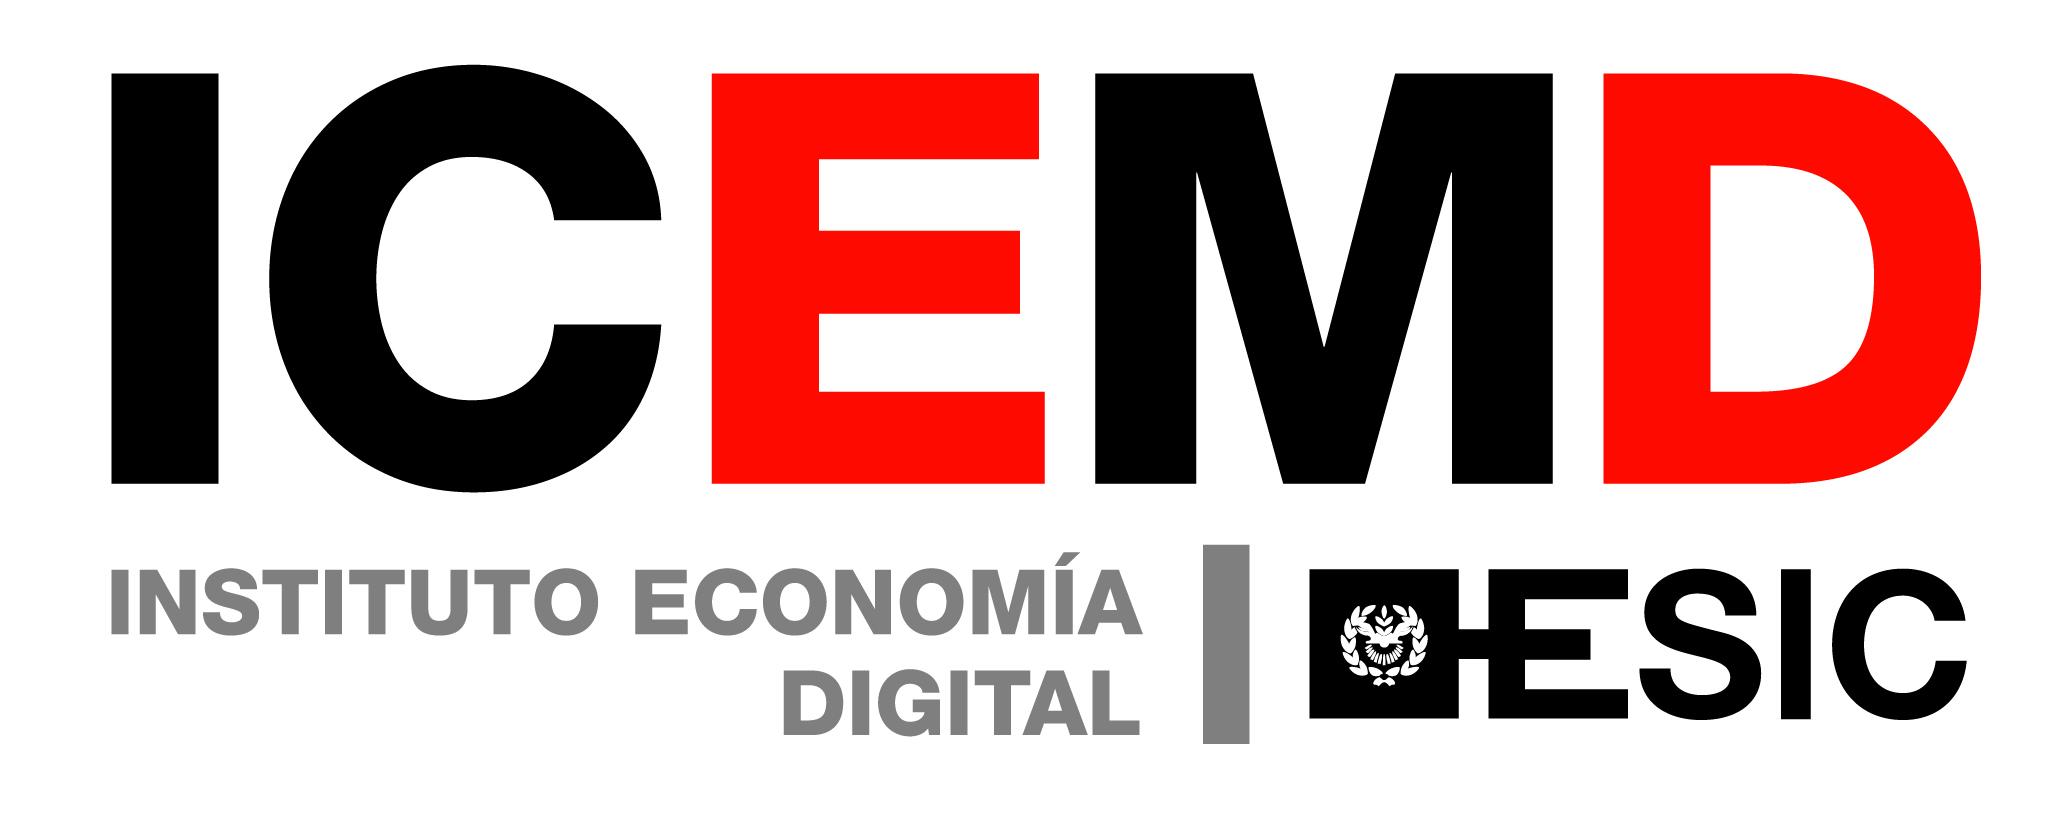 ICEMD_Instituto_Economia_Digital_ESIC_CMYK.jpg